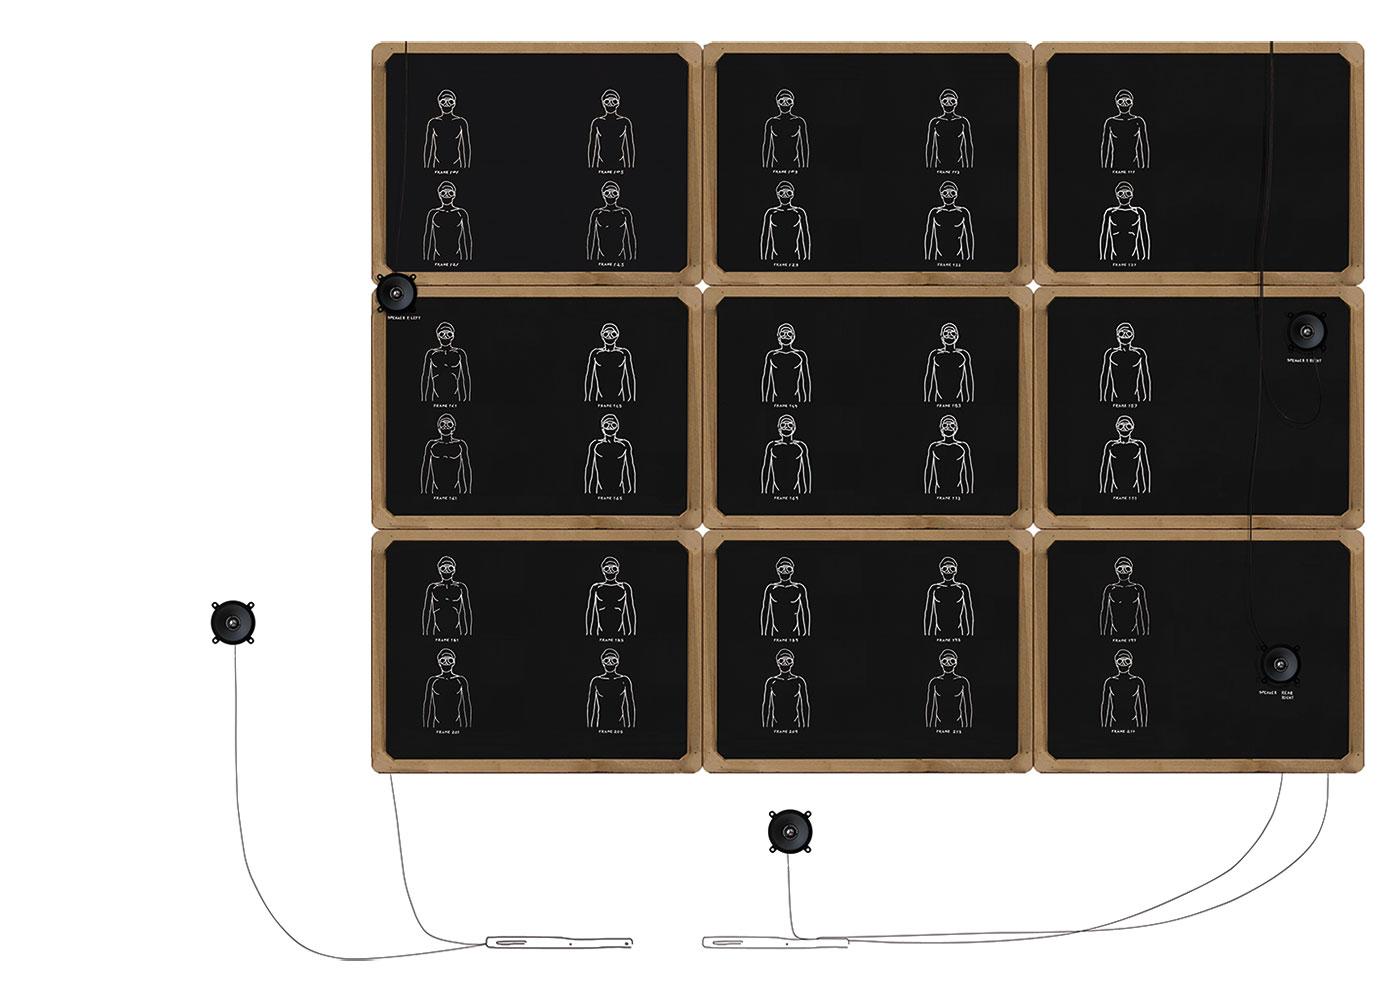 slate, chalk, wood, audio equipment, size of boards cm 155 x 115 x 5. 2007